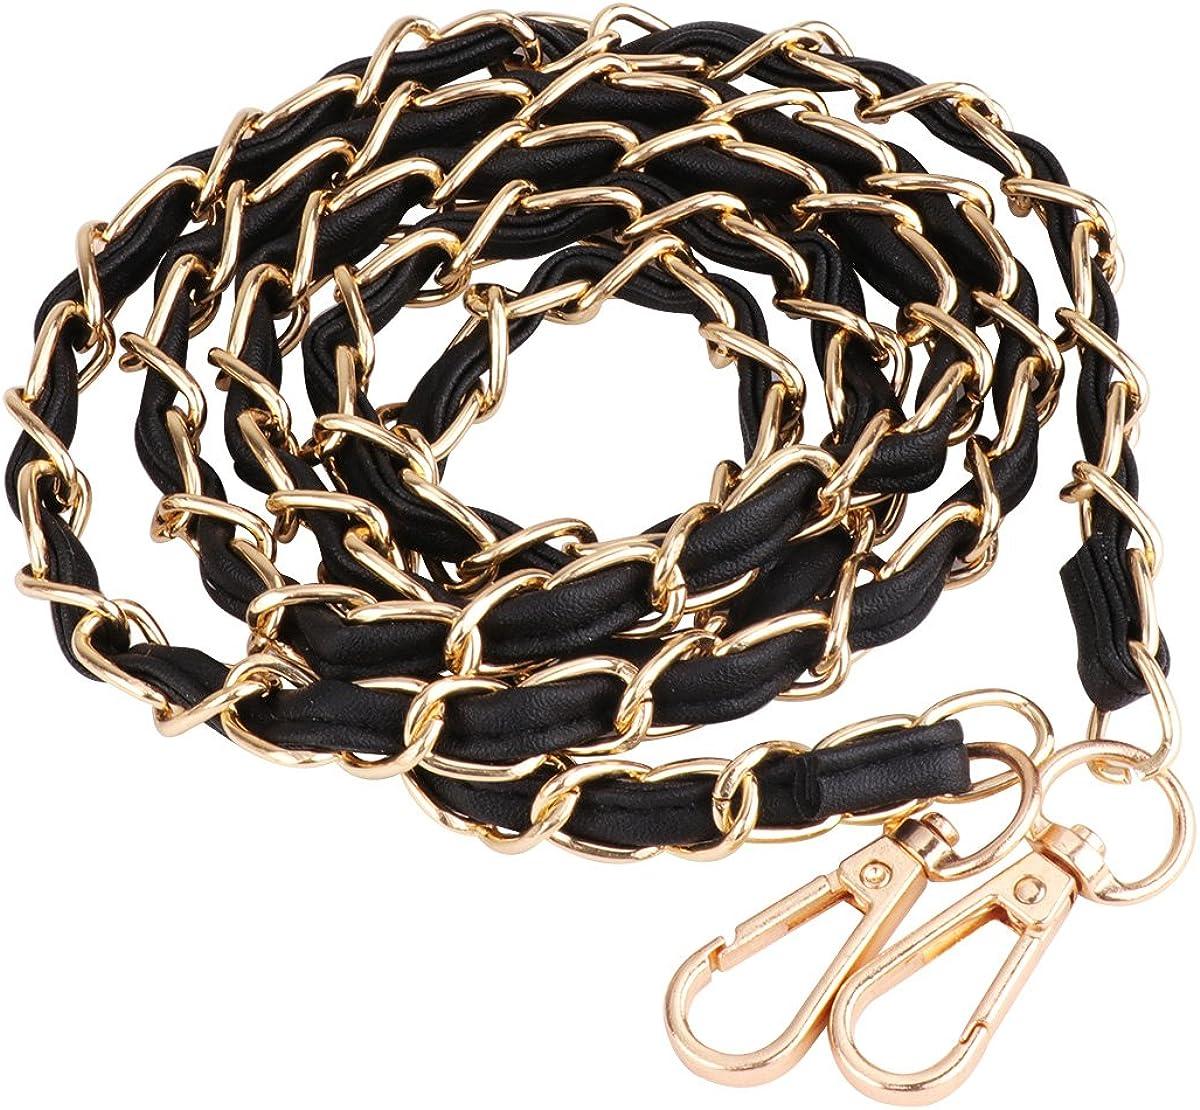 Vintage Chain Strap Purse Handbag Shoulder Cross Body Replacement Chains Accessories